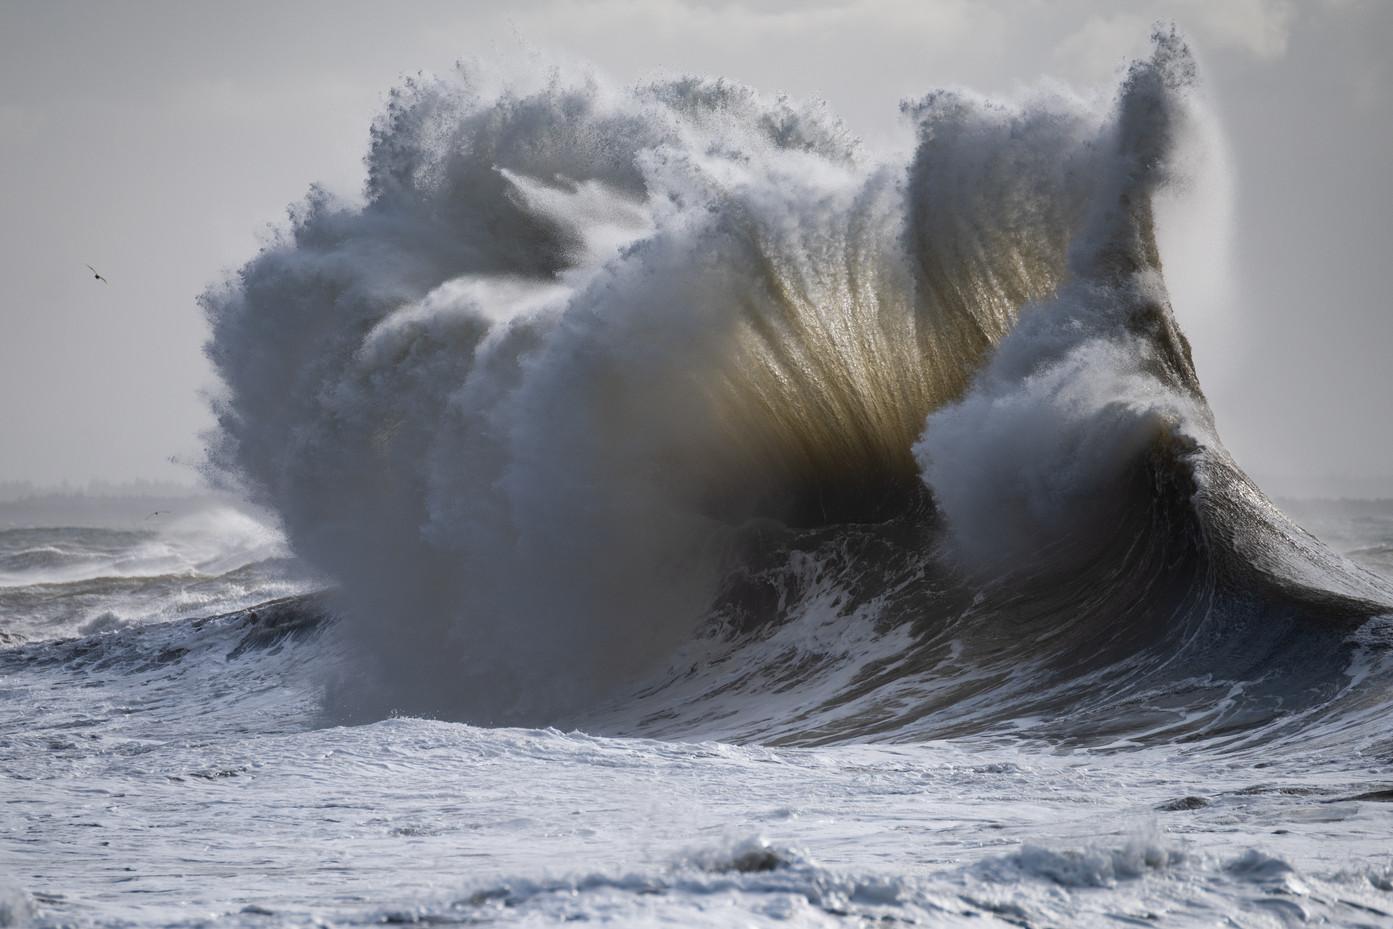 The Ocean's Power